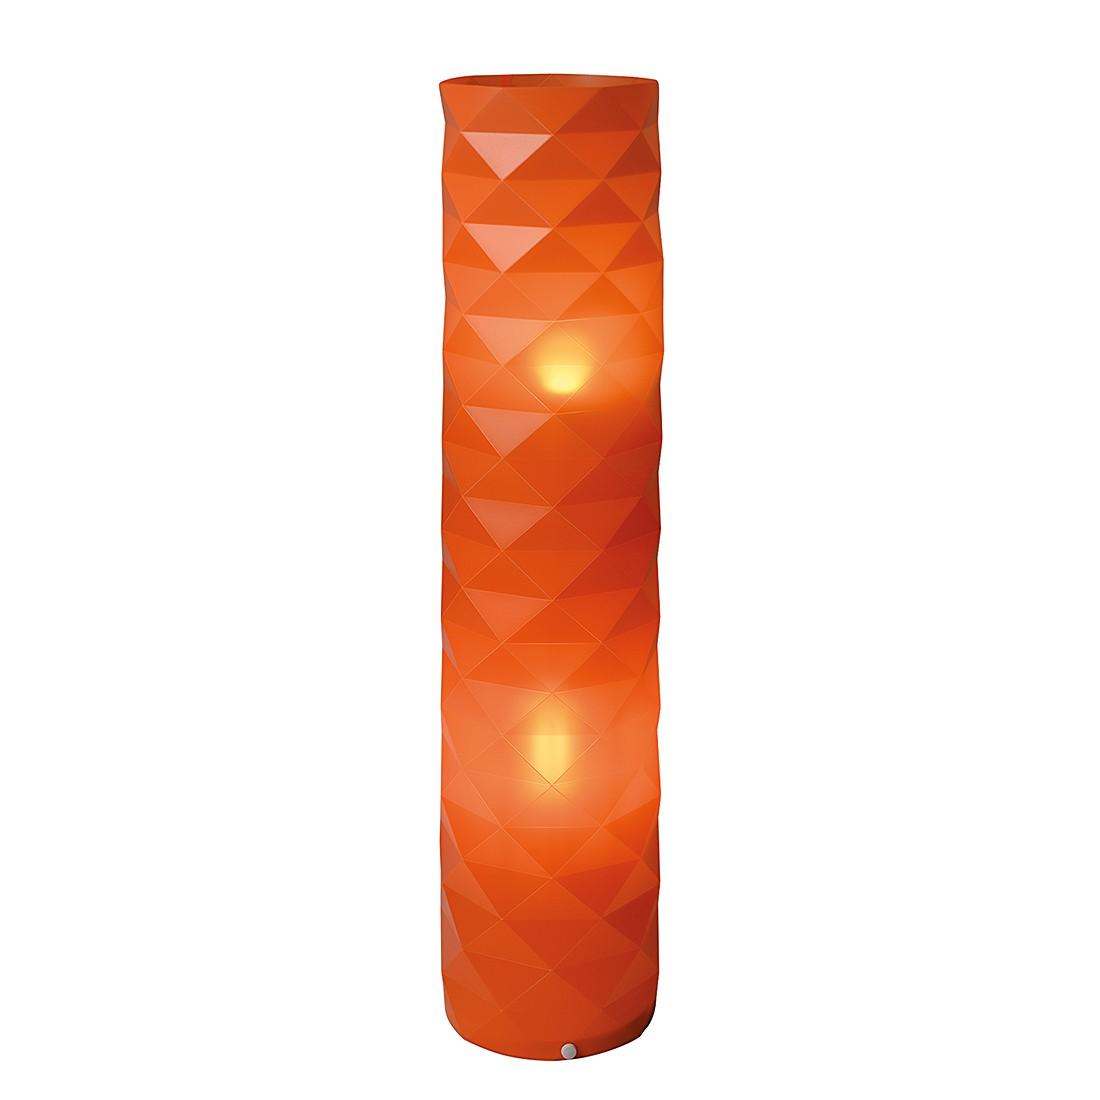 Stehleuchte ● Metall/Kunststoff ● 2-flammig- Lux A++